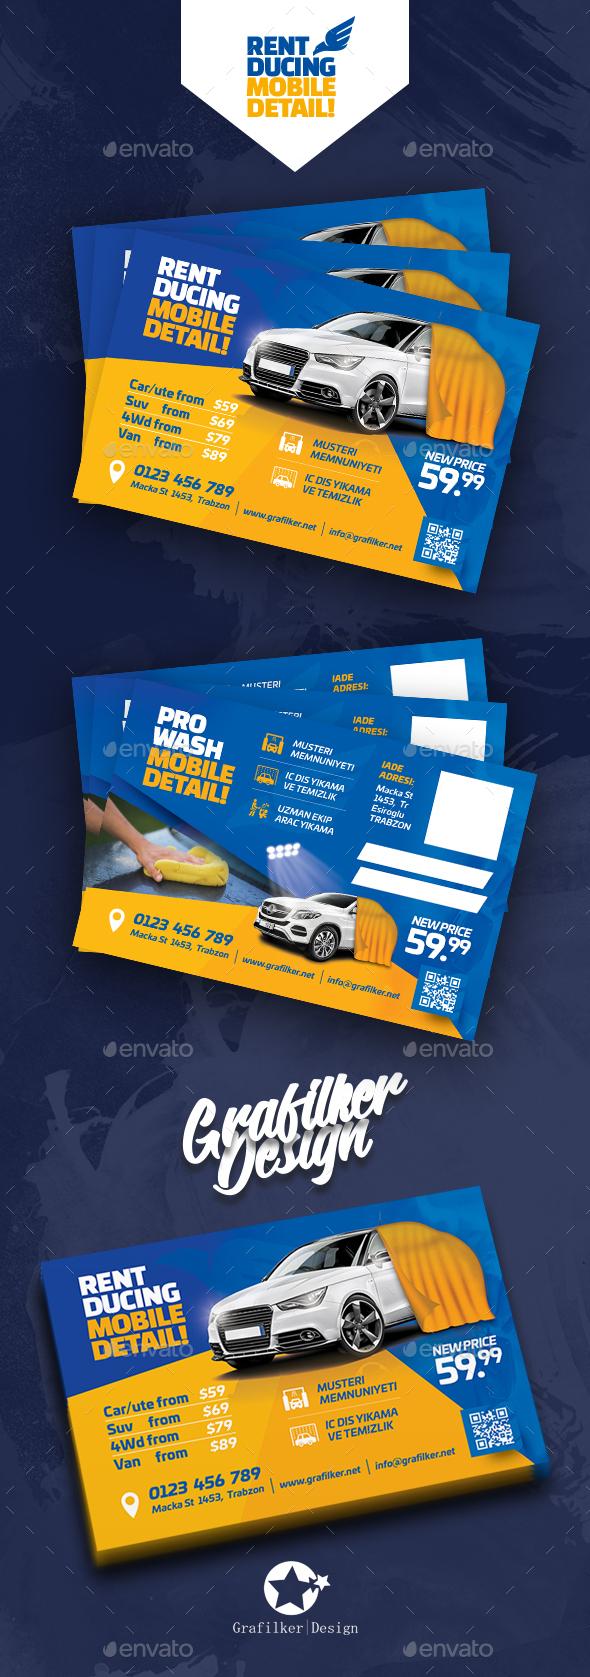 Car Wash Postcard Templates - Cards & Invites Print Templates